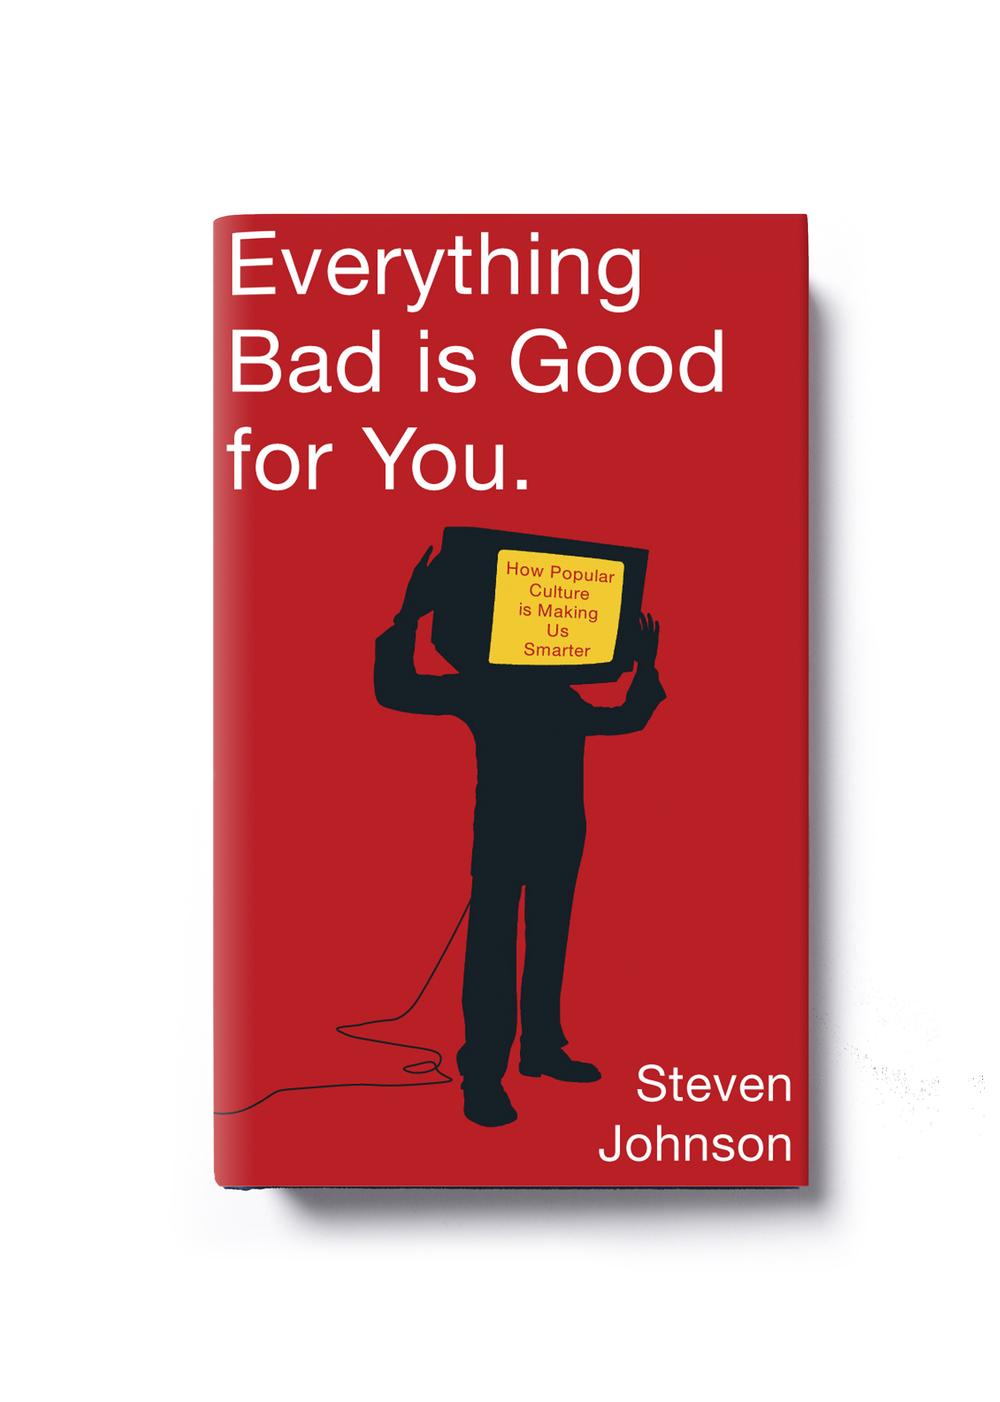 Everything Bad is Good for You by Steven Johnson - Art Direction: Jim Stoddart Design: Keenan